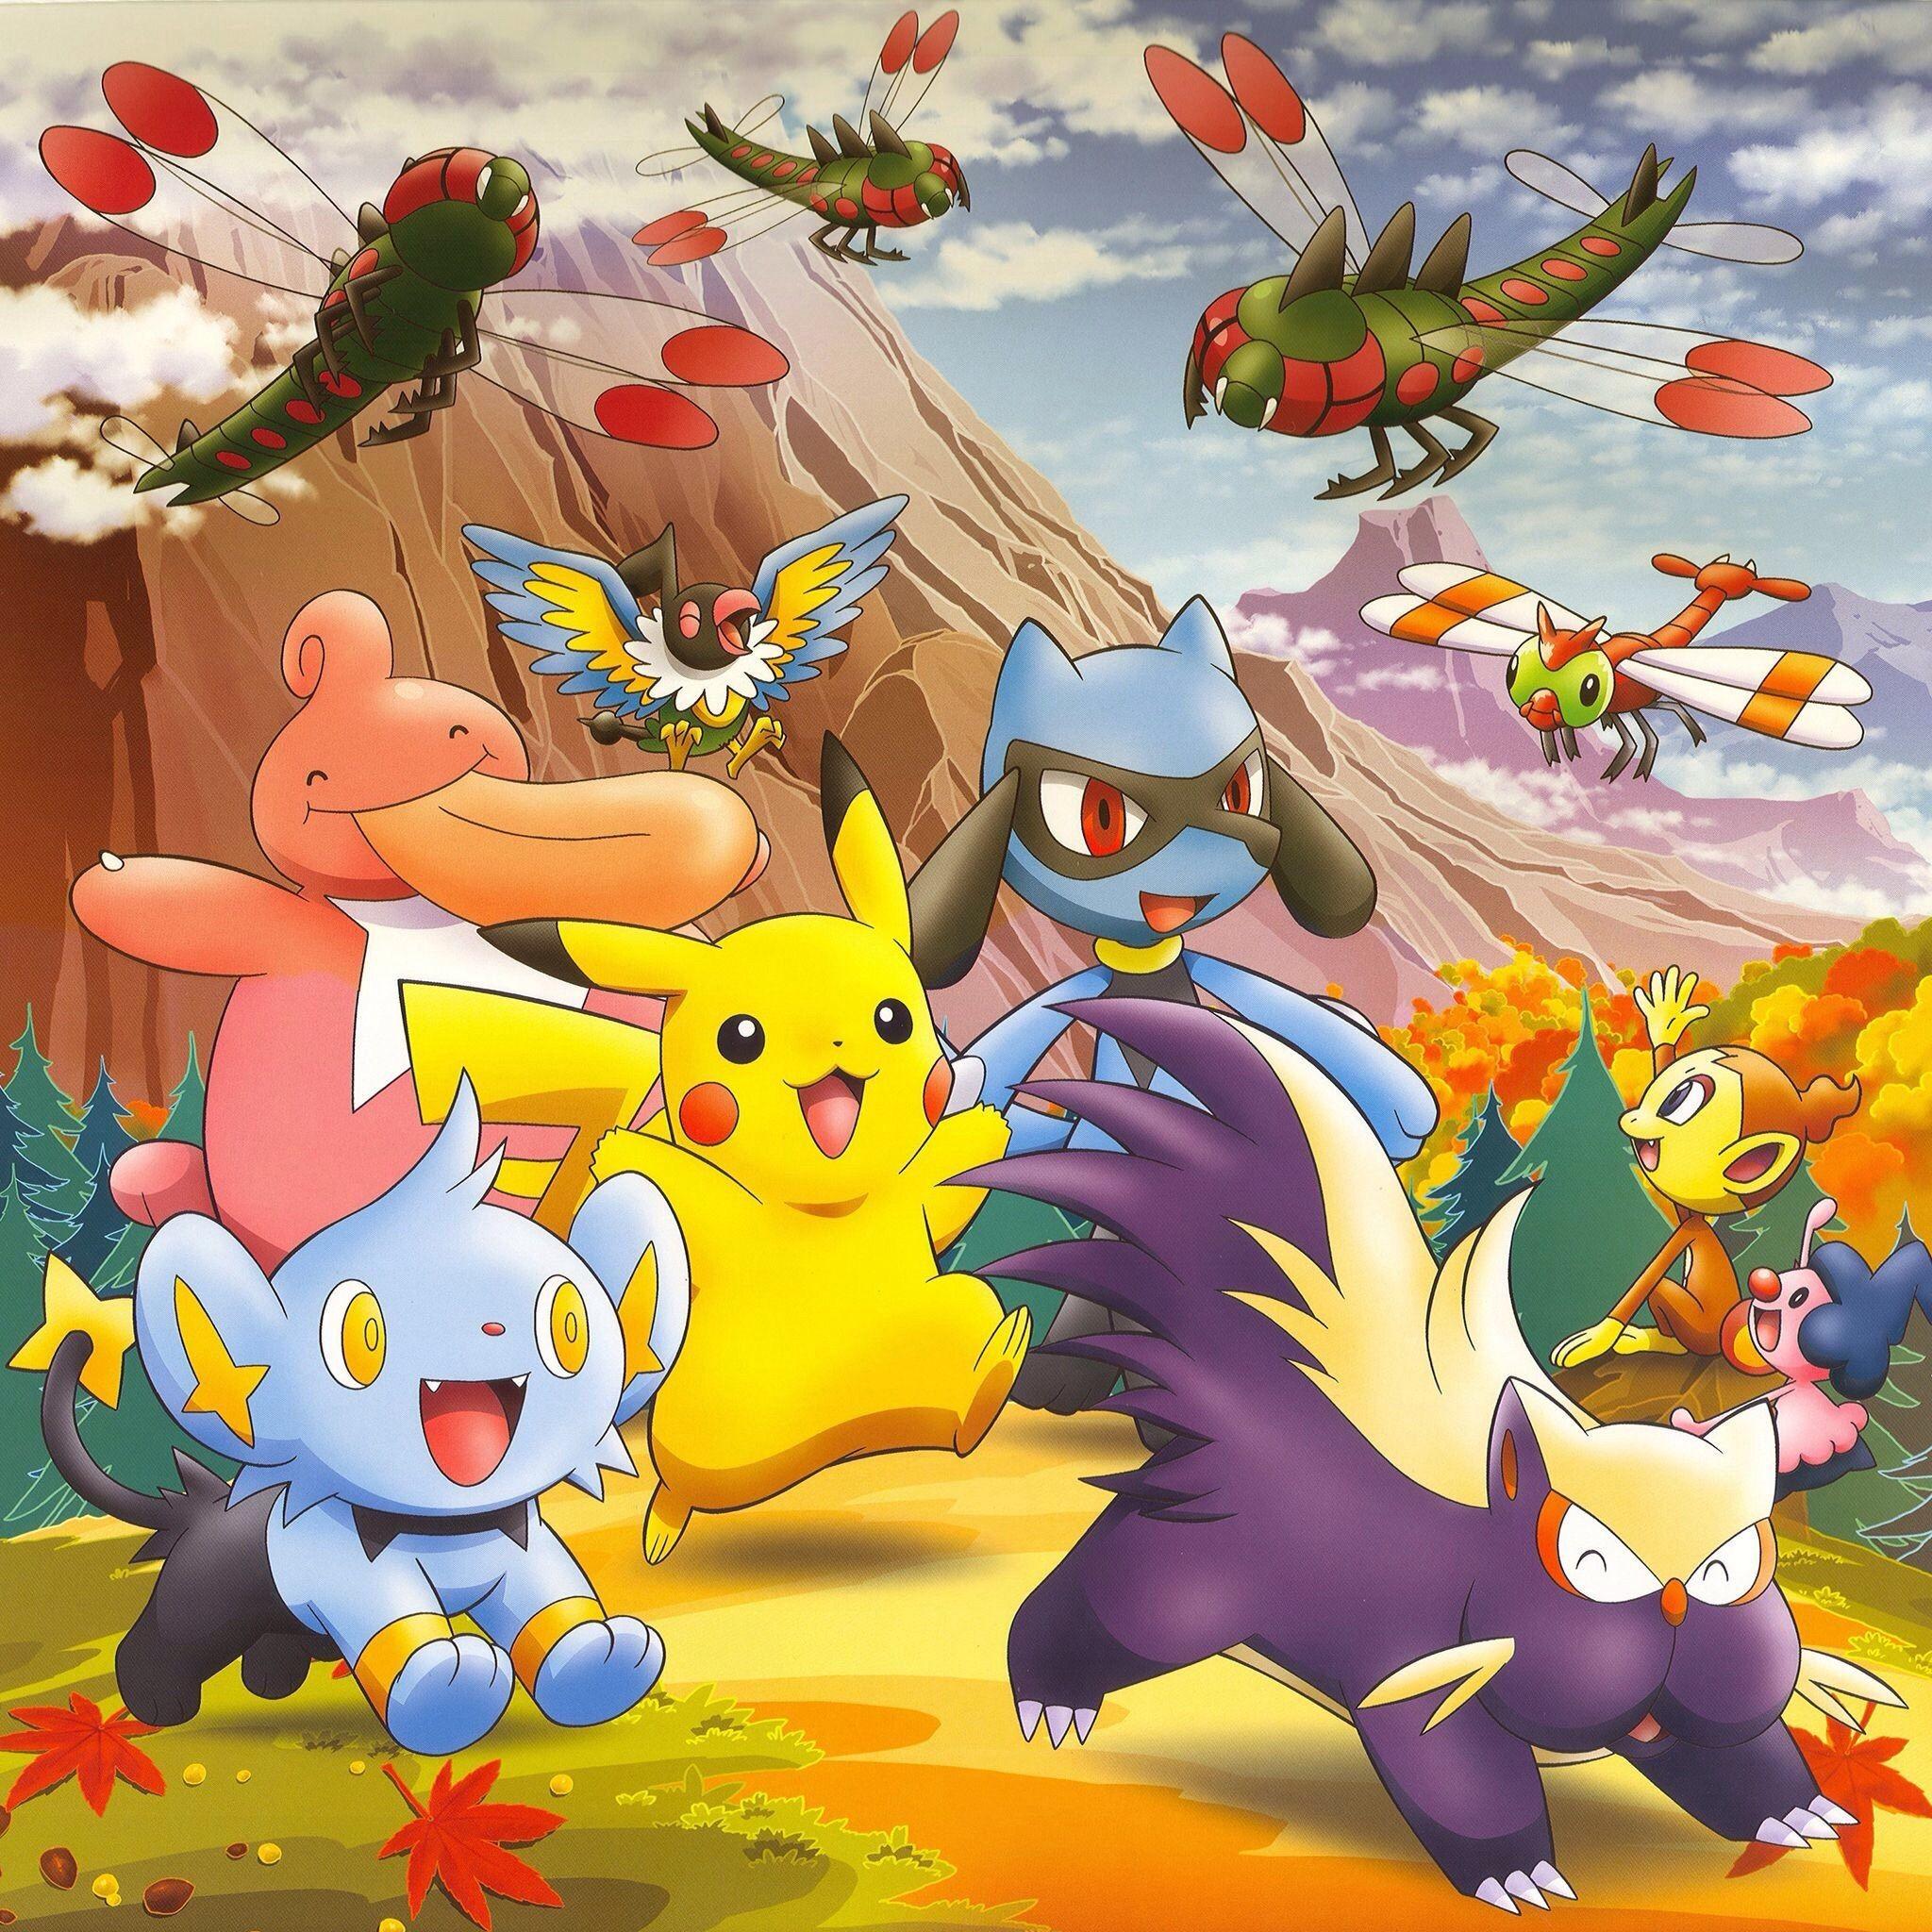 [Image - 790264] | Pokemon | Know Your Meme